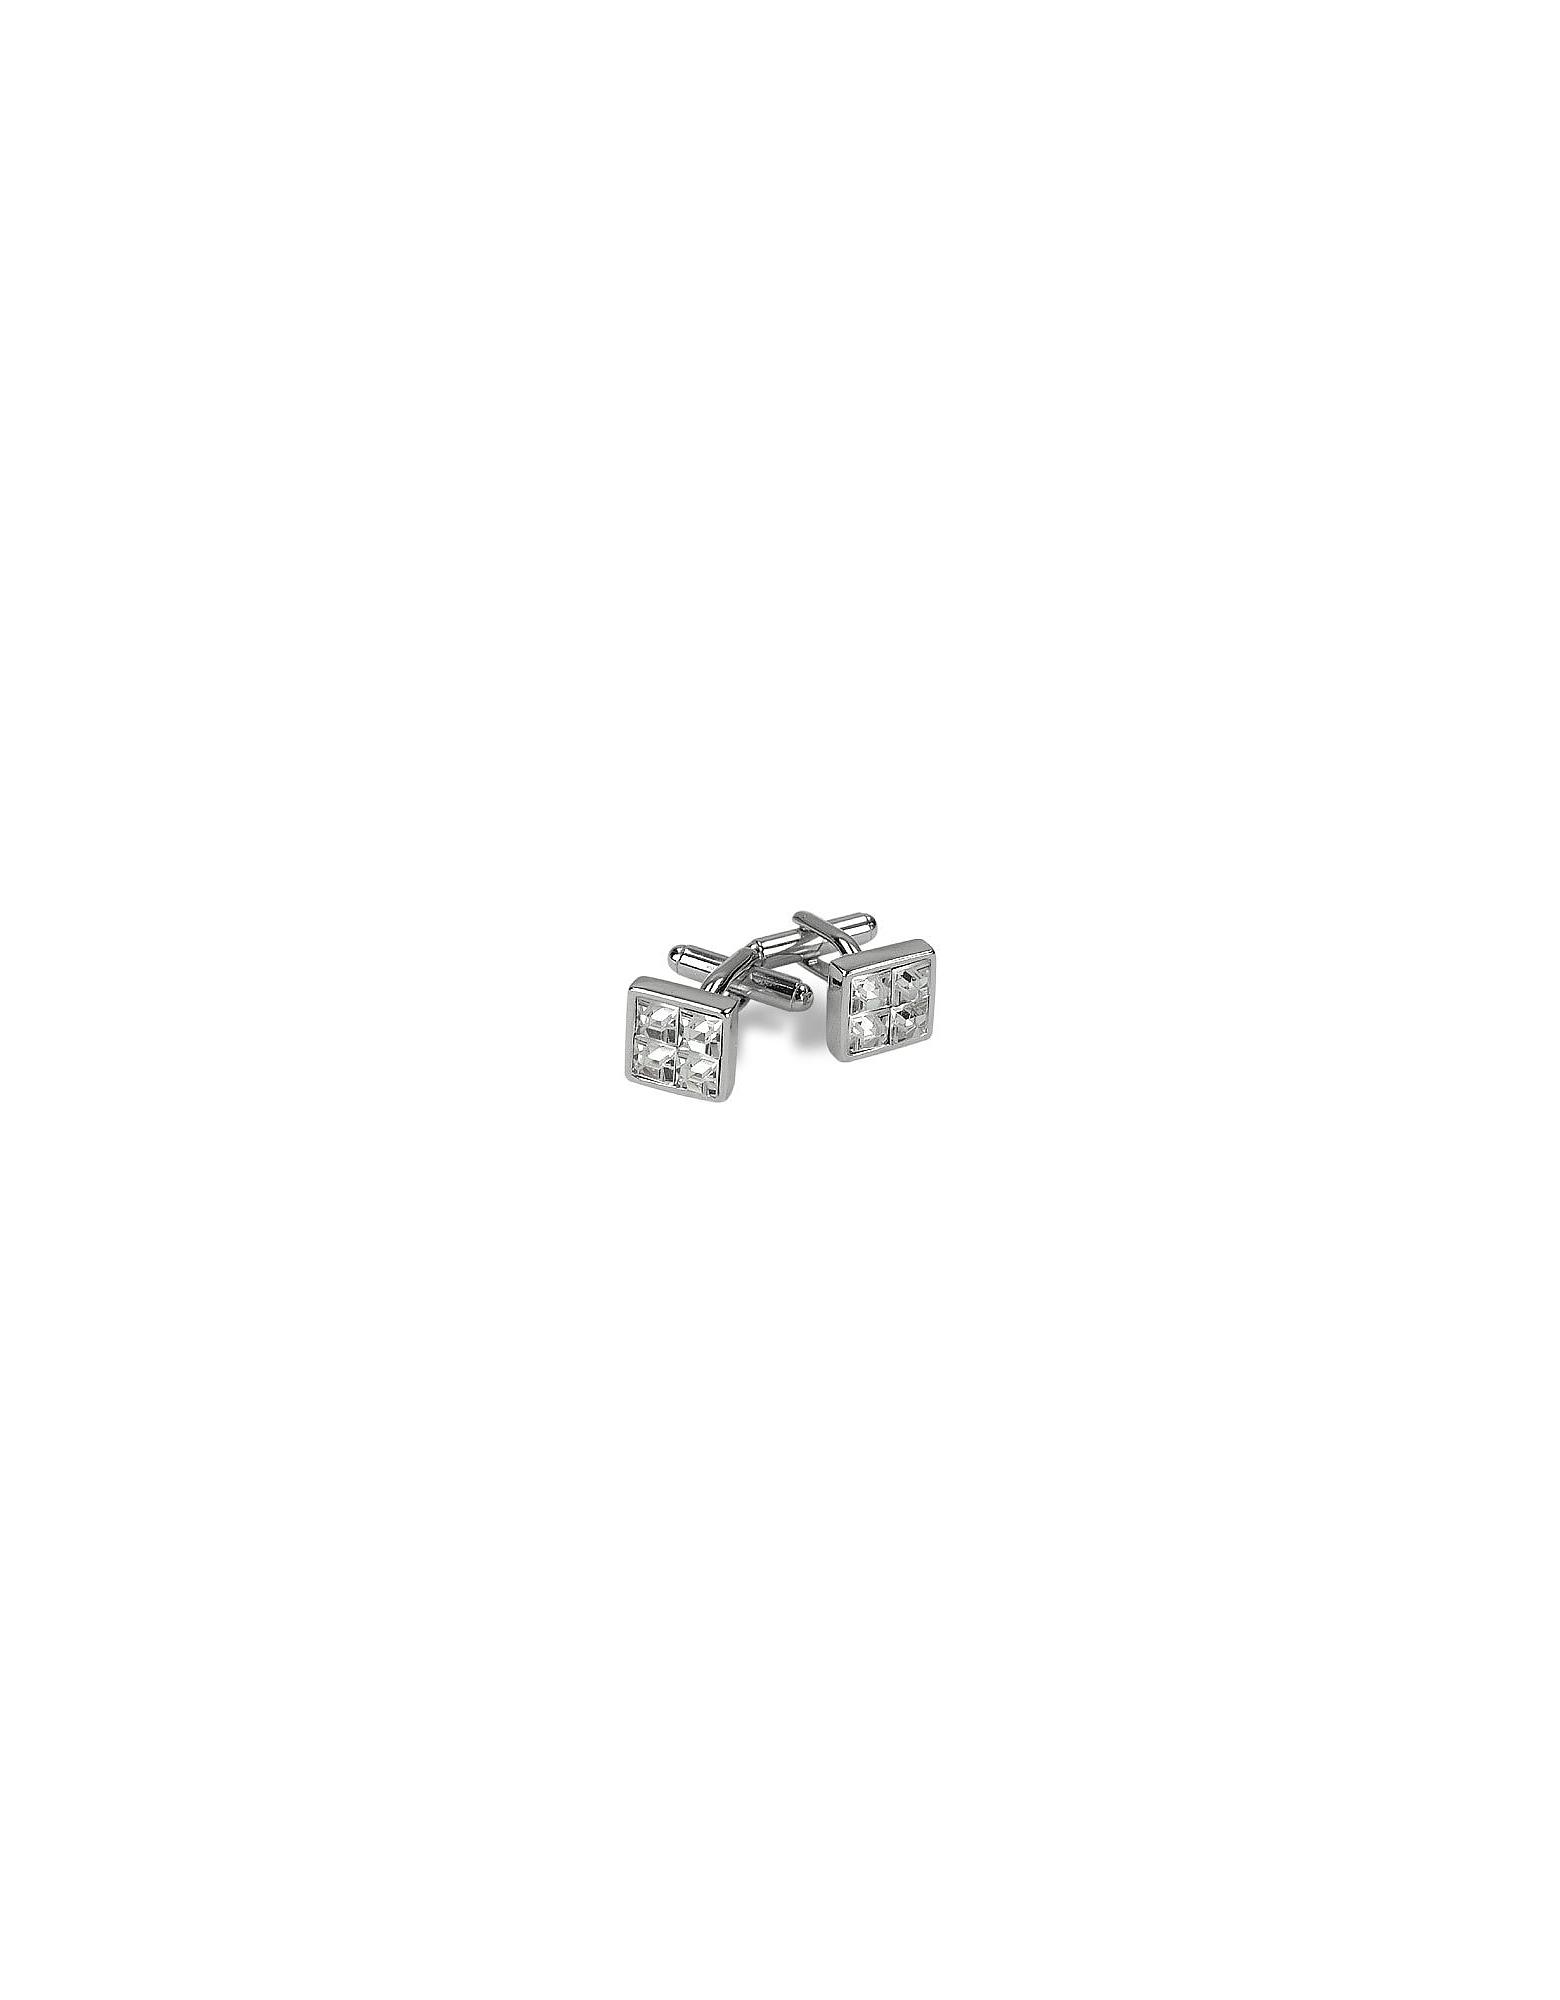 AZ Collection Cufflinks, Silver Plated Jeweled Cufflinks